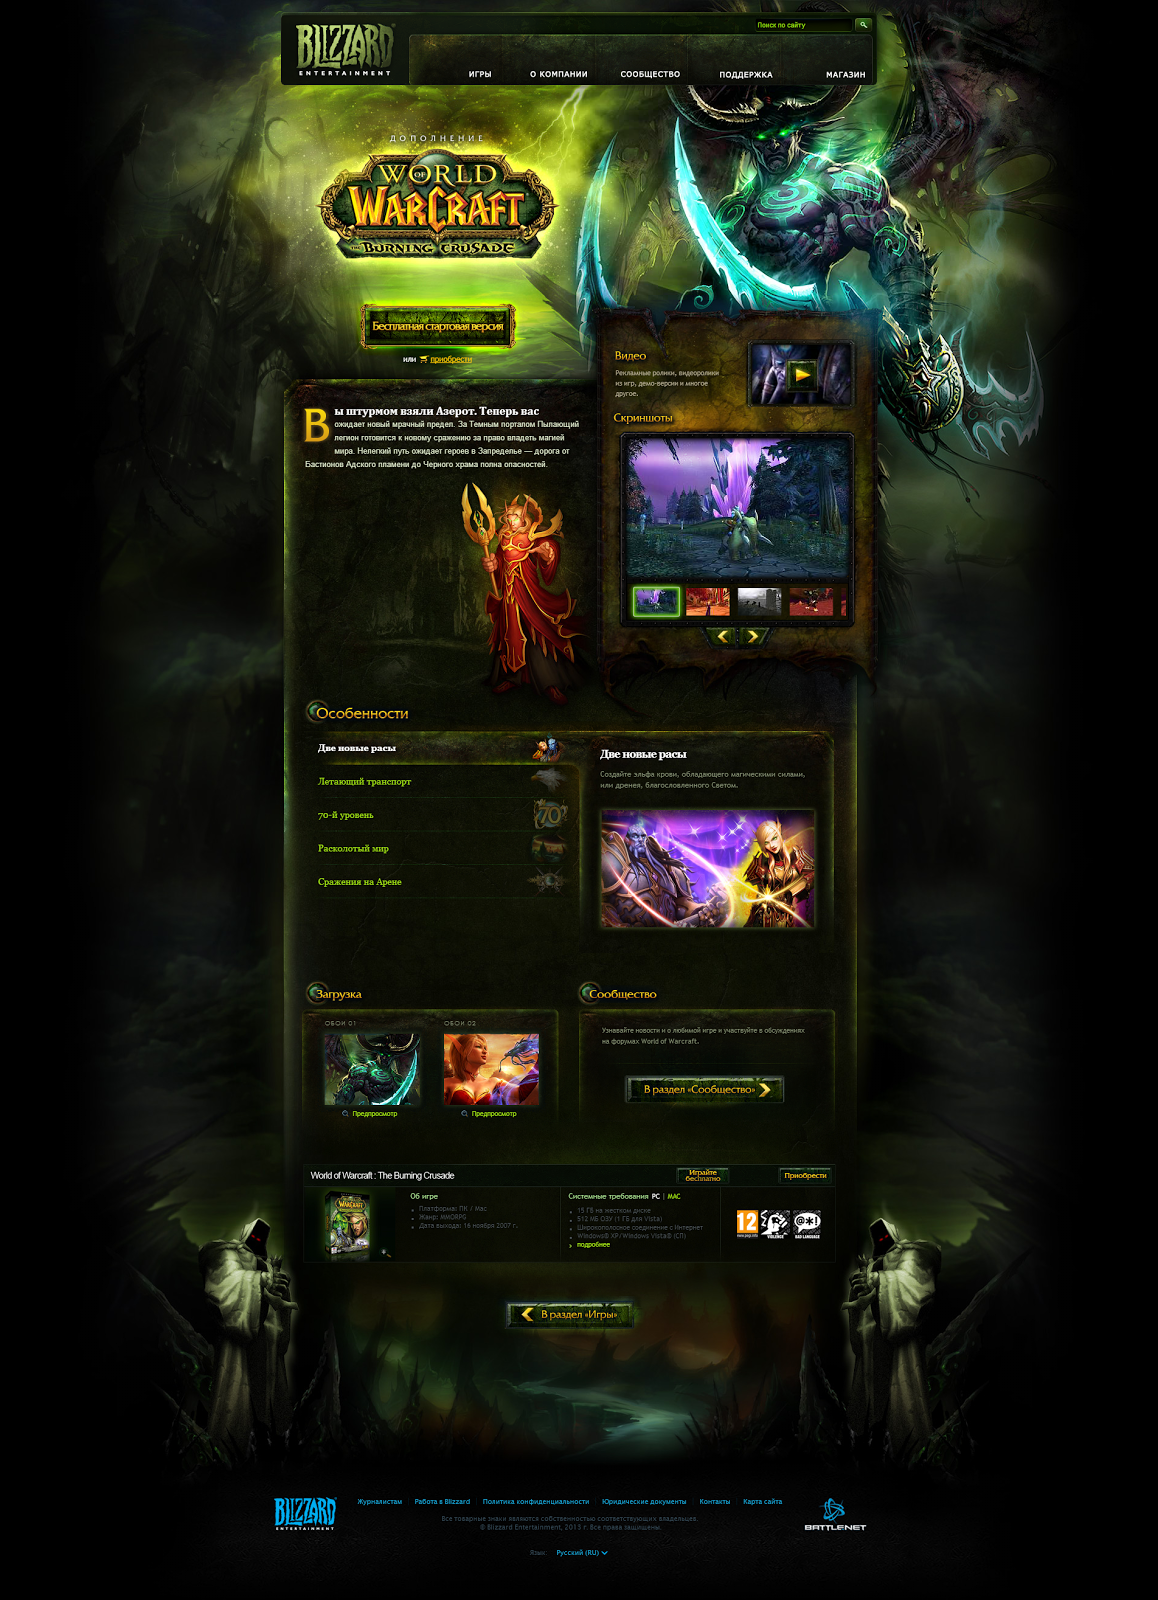 Blizzard Entertainment World Of Warcraft The Burning Crusade Png Promotional Design Web Layout Design Game Design